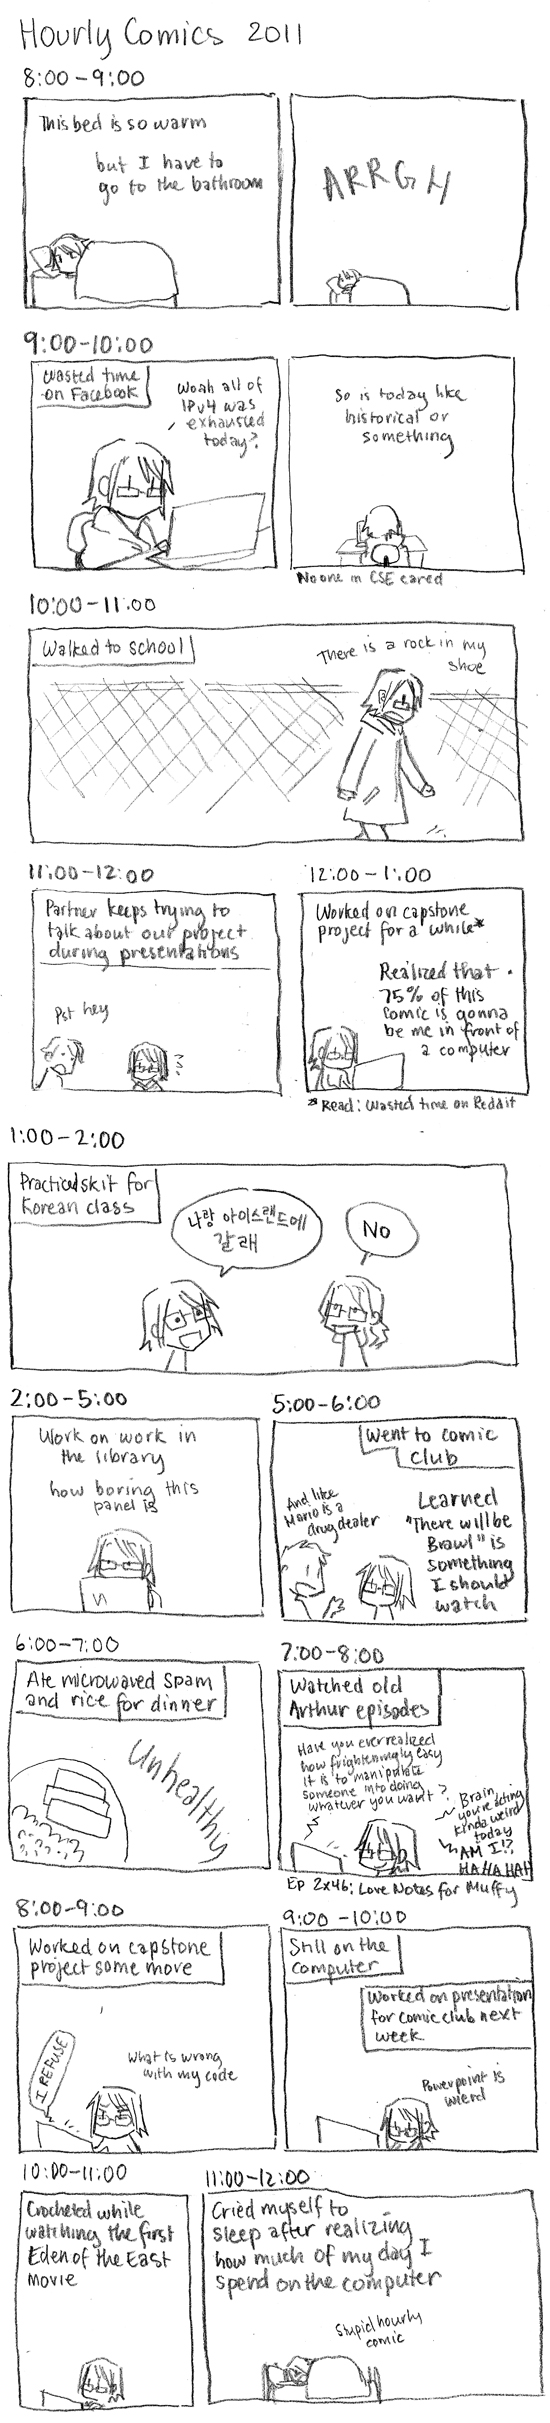 Hourly Comics Day 2011